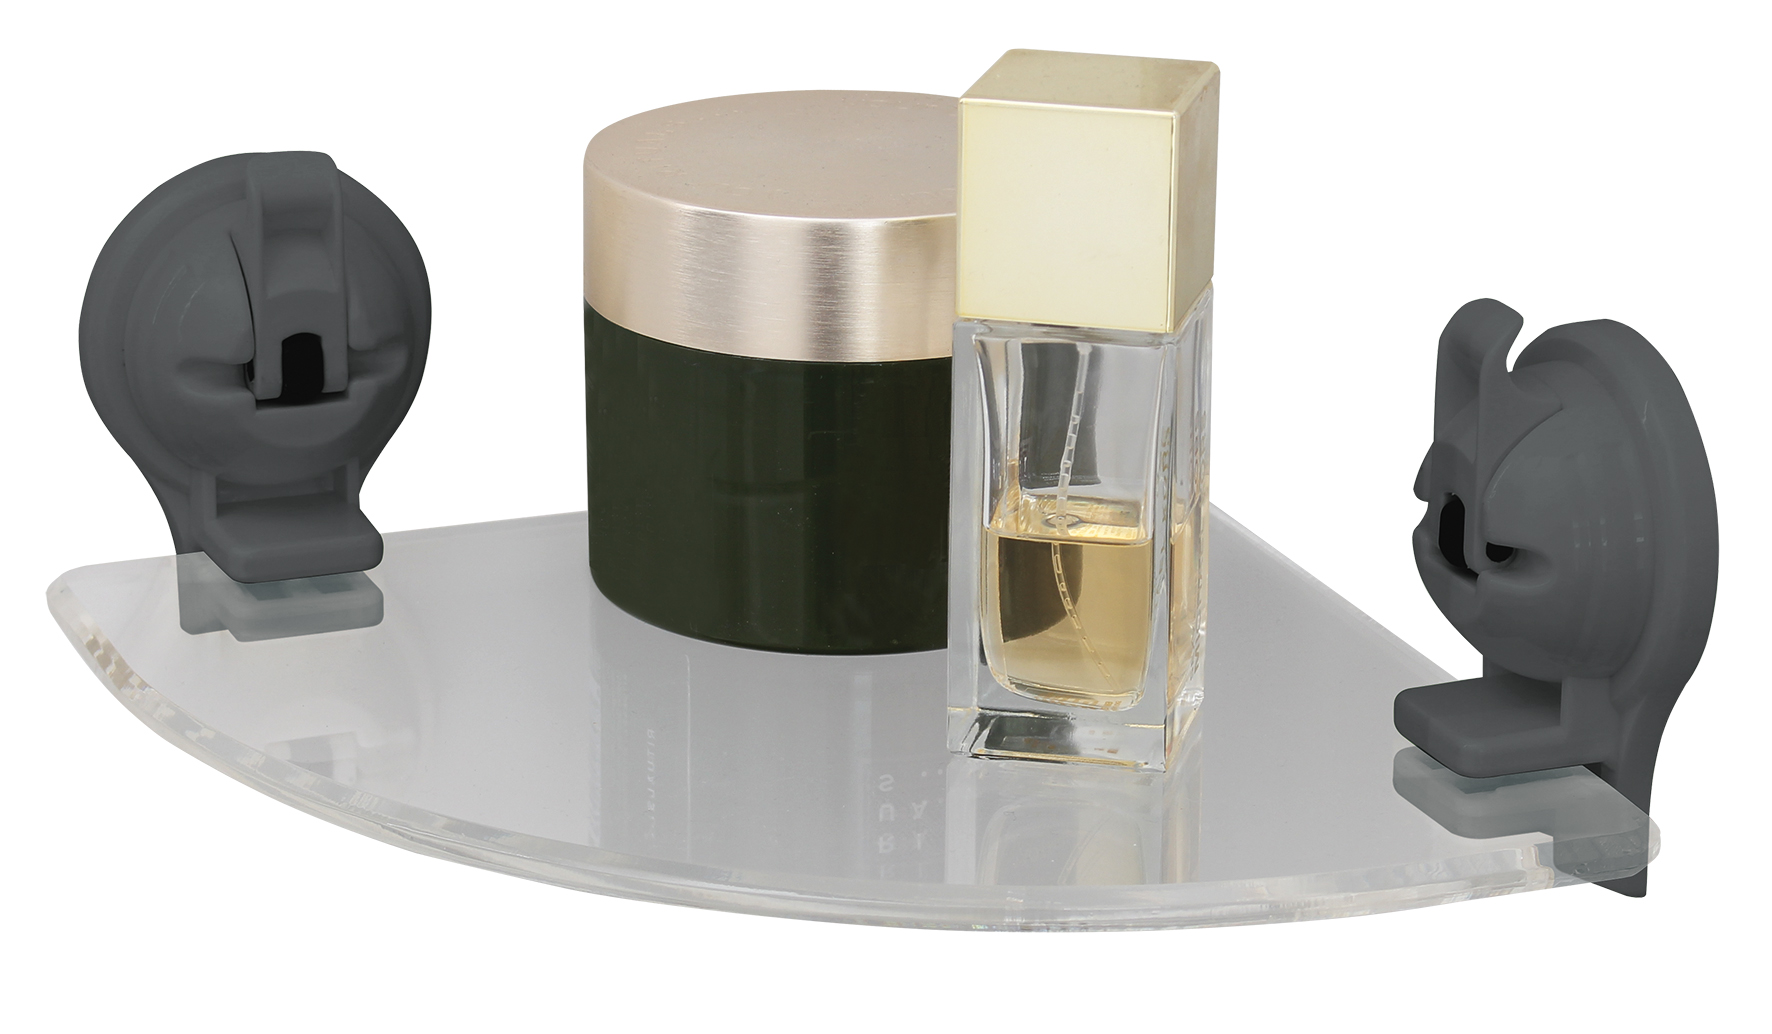 ecke regal eurotrail. Black Bedroom Furniture Sets. Home Design Ideas